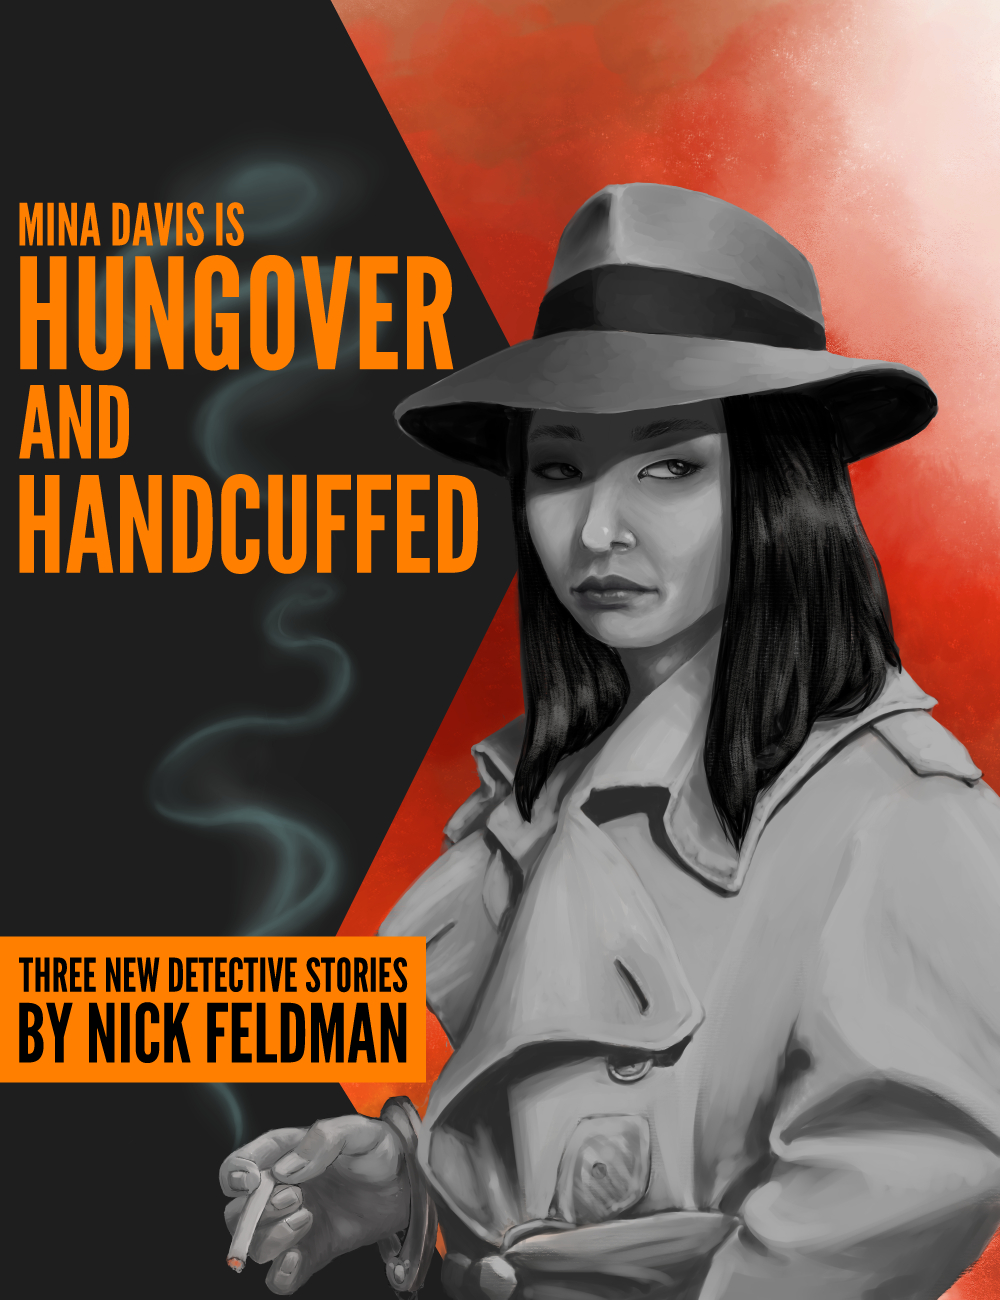 Mina Davis is Hungover and Handcuffed - By Nick Feldman